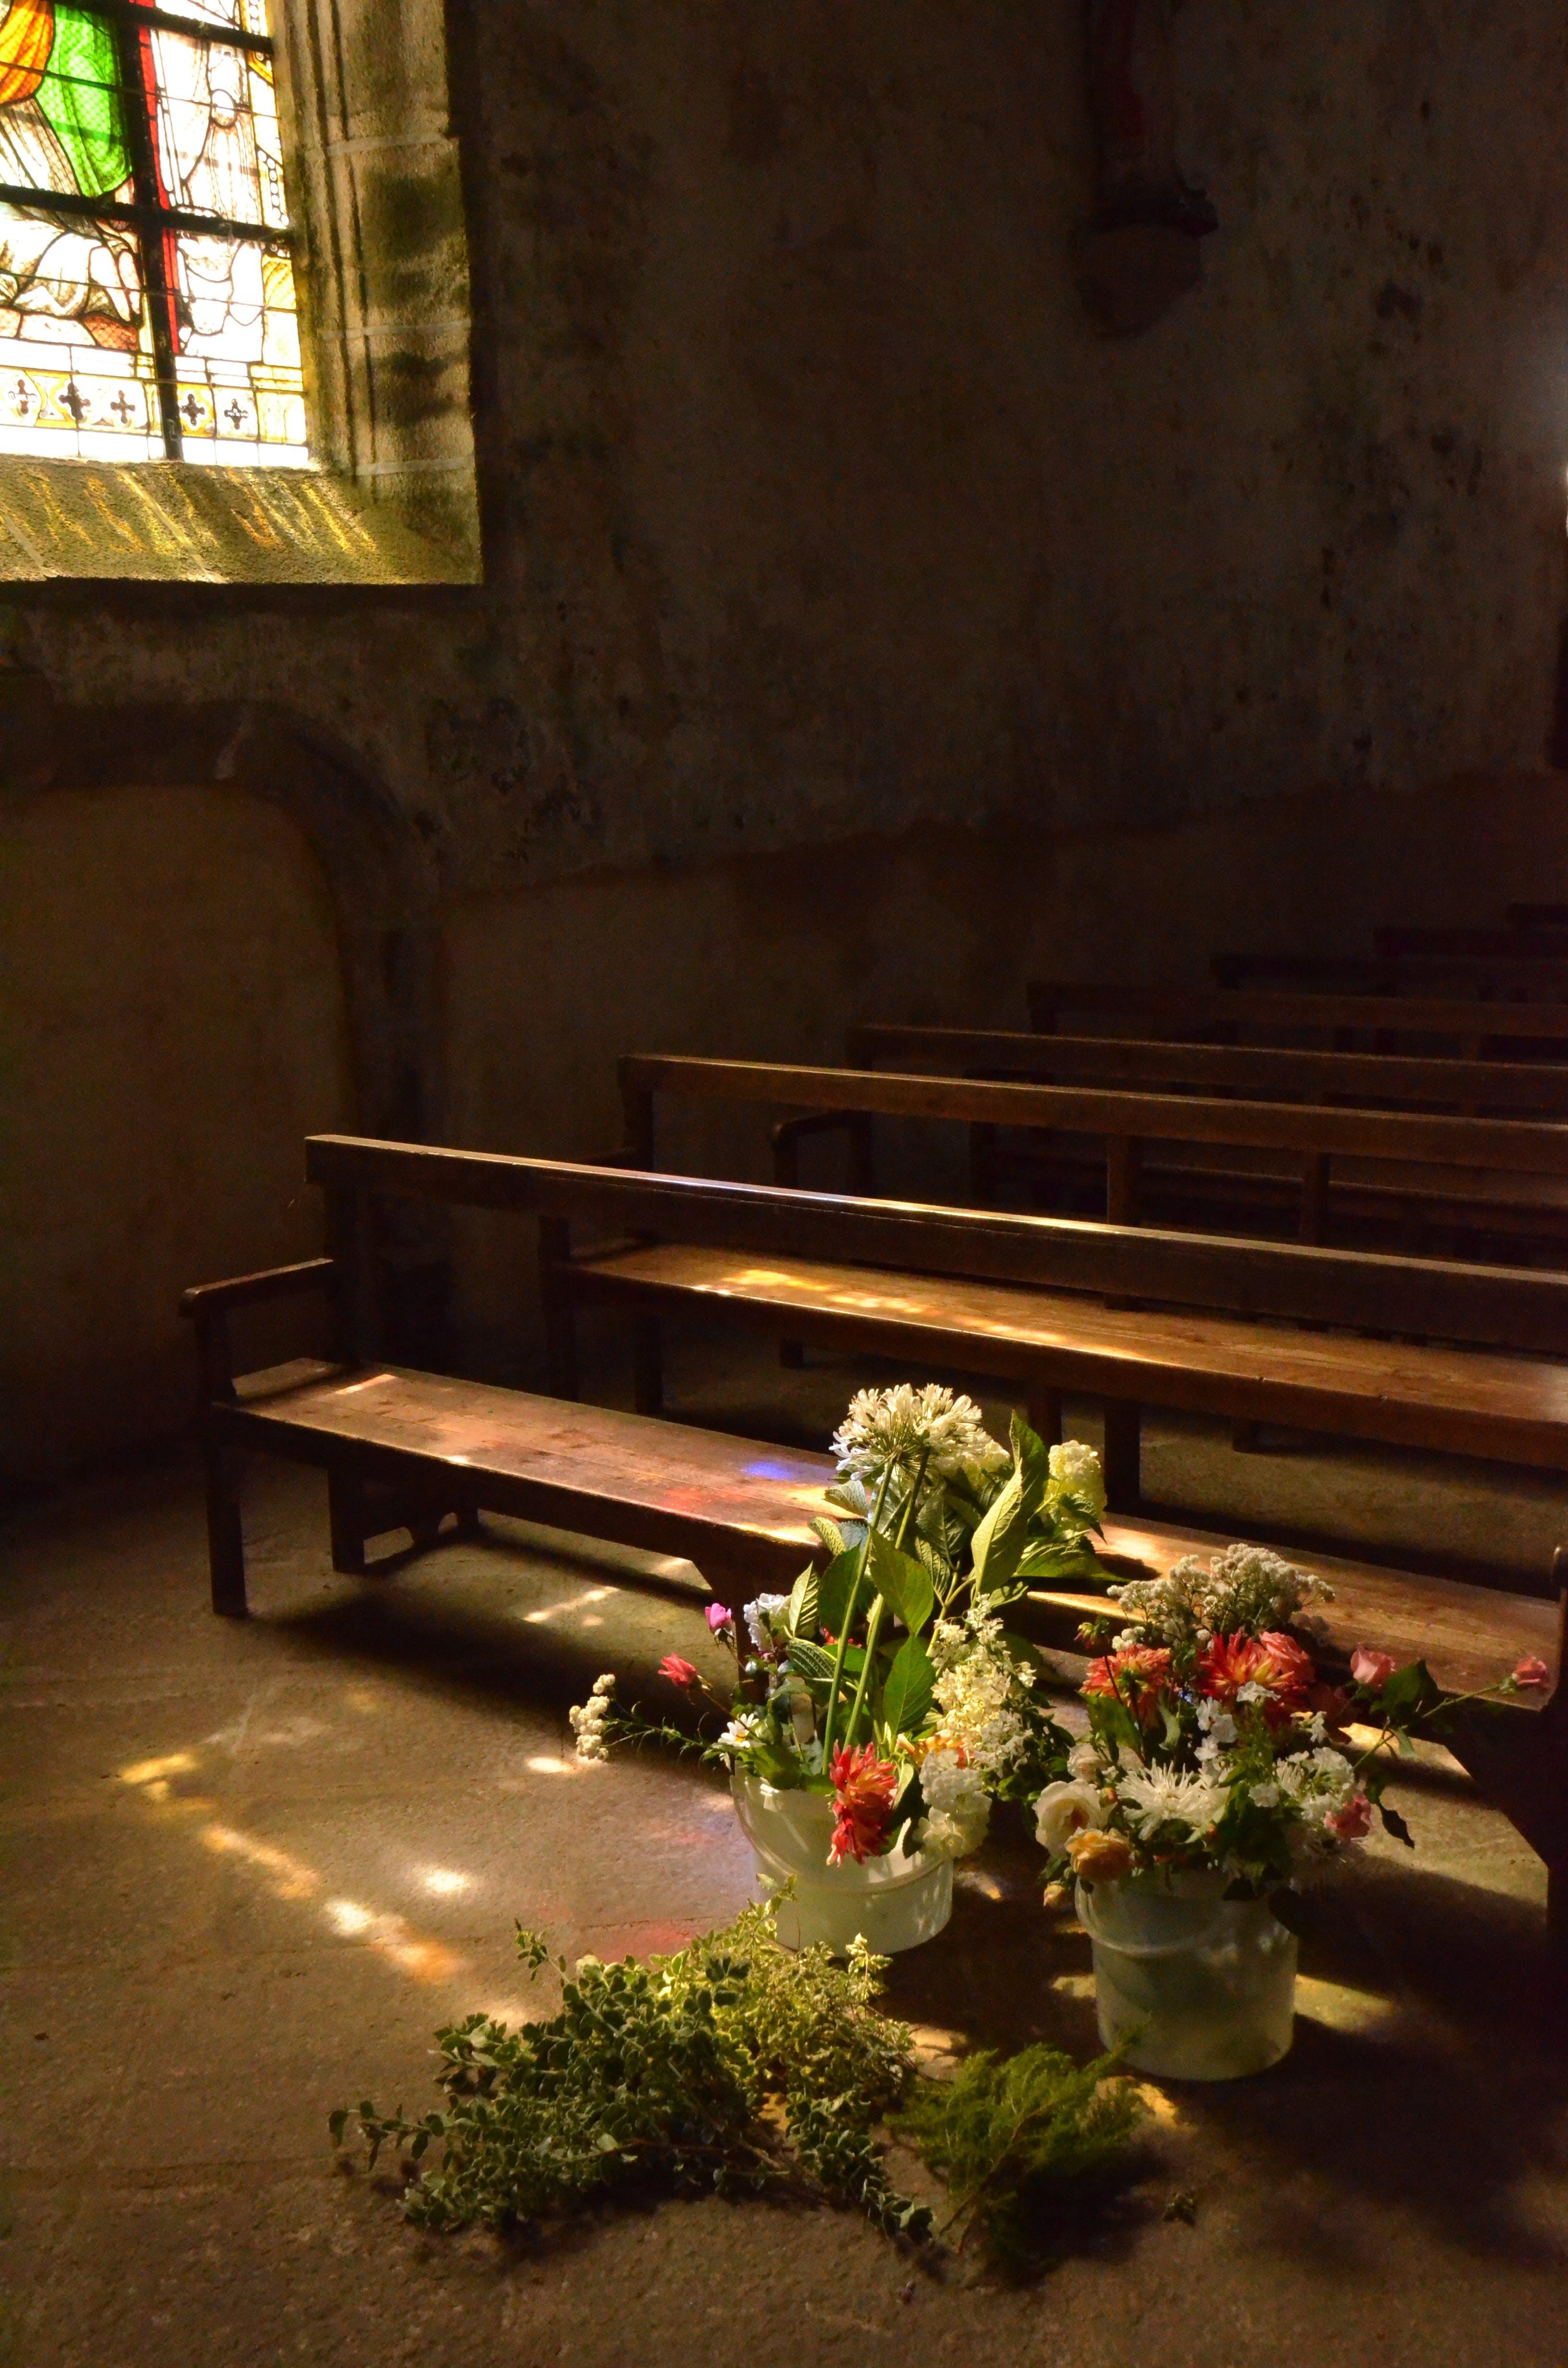 Flowers Placed Beside Brown Wooden Pew Inside Chapel